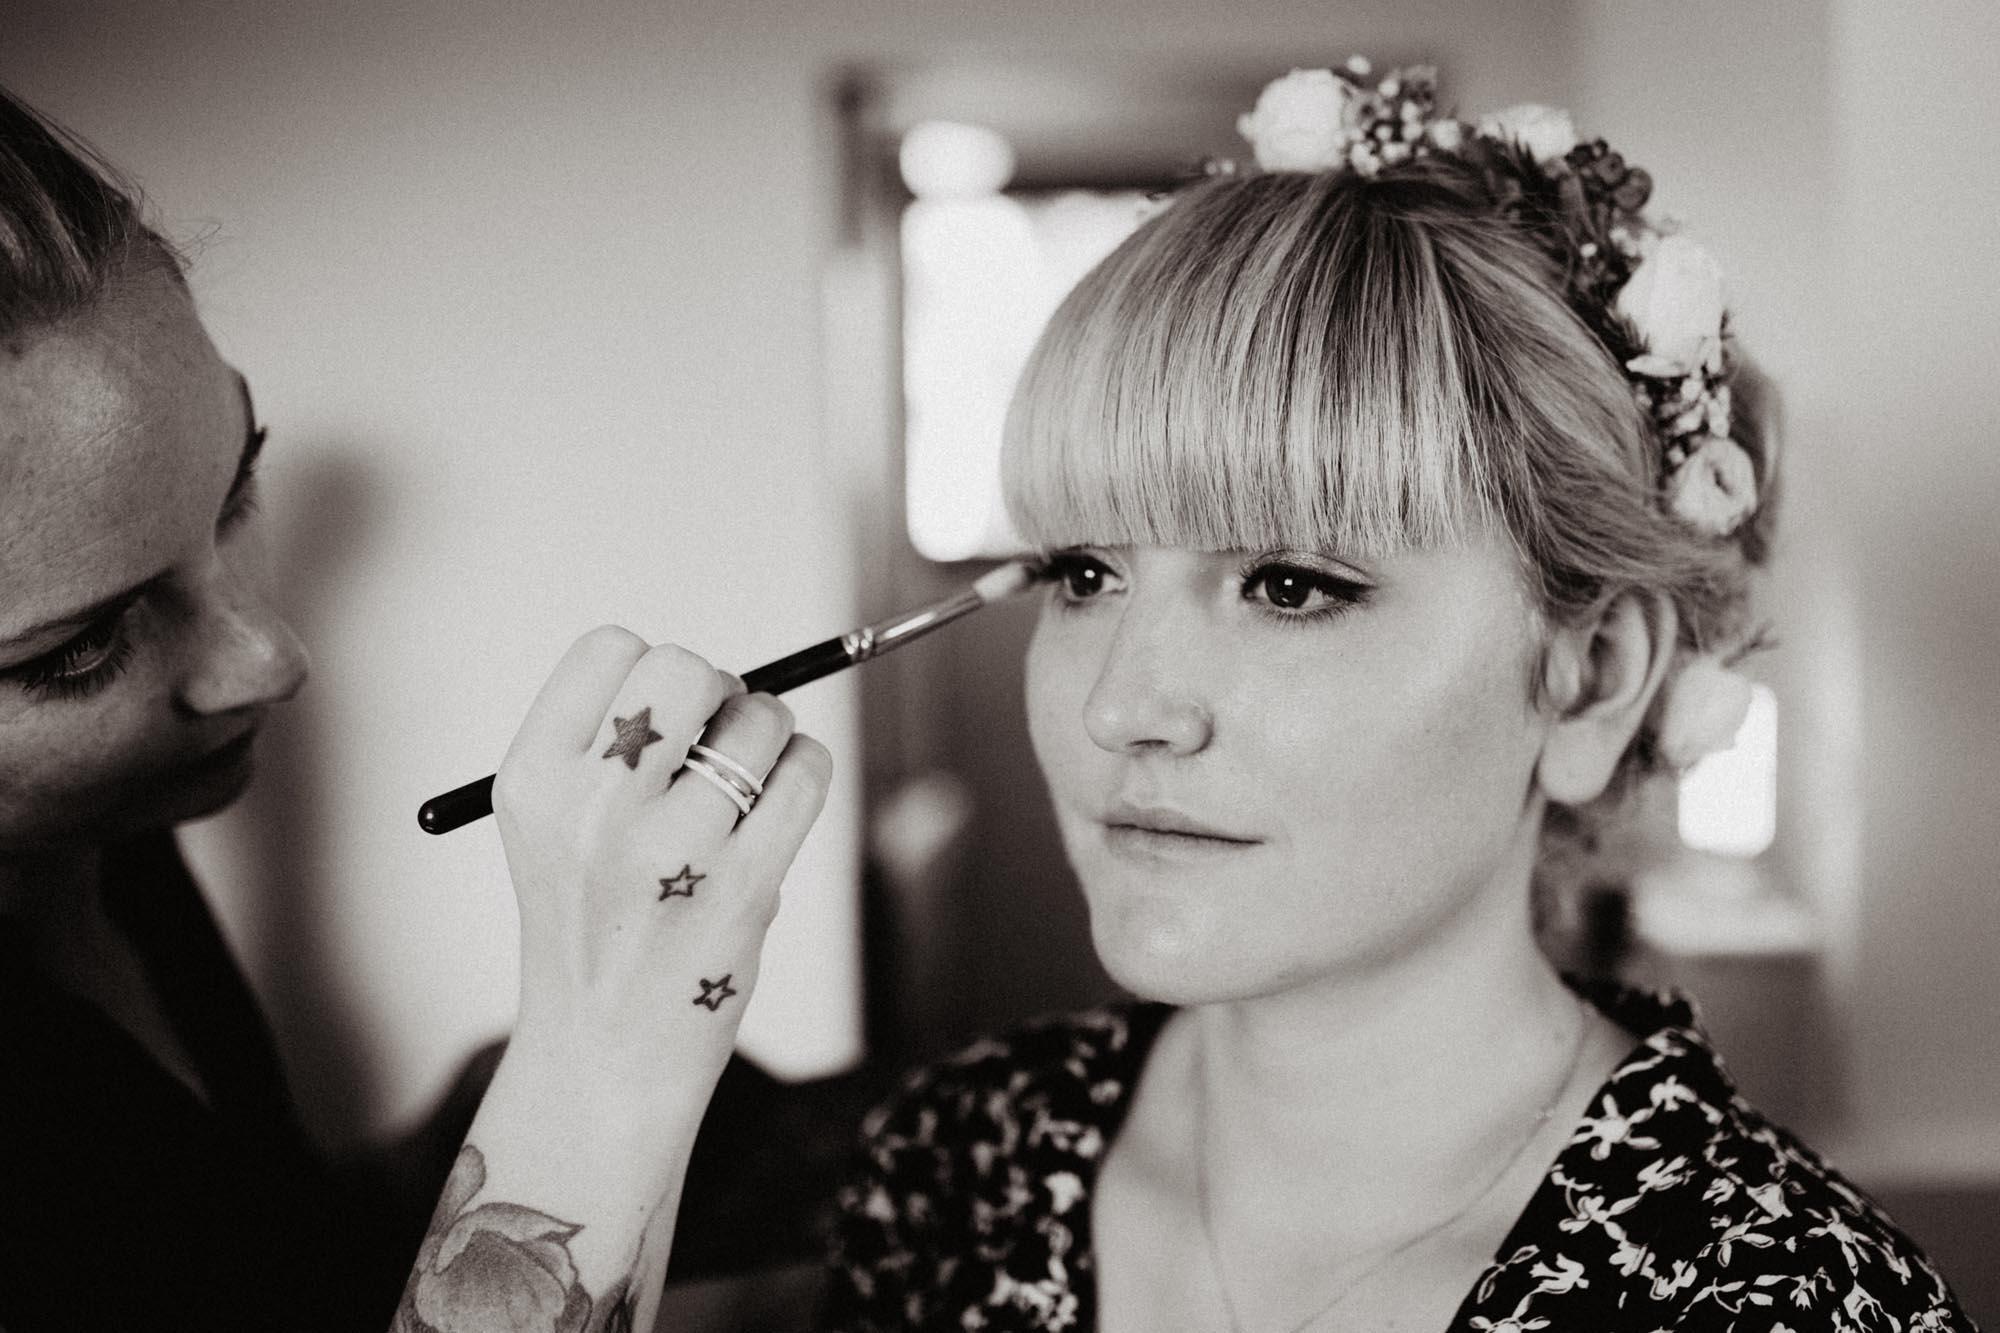 Crédit : Karolina B Photography | mariage A&W |coiffure Lucie Leclerc | Labastide Beauvoir